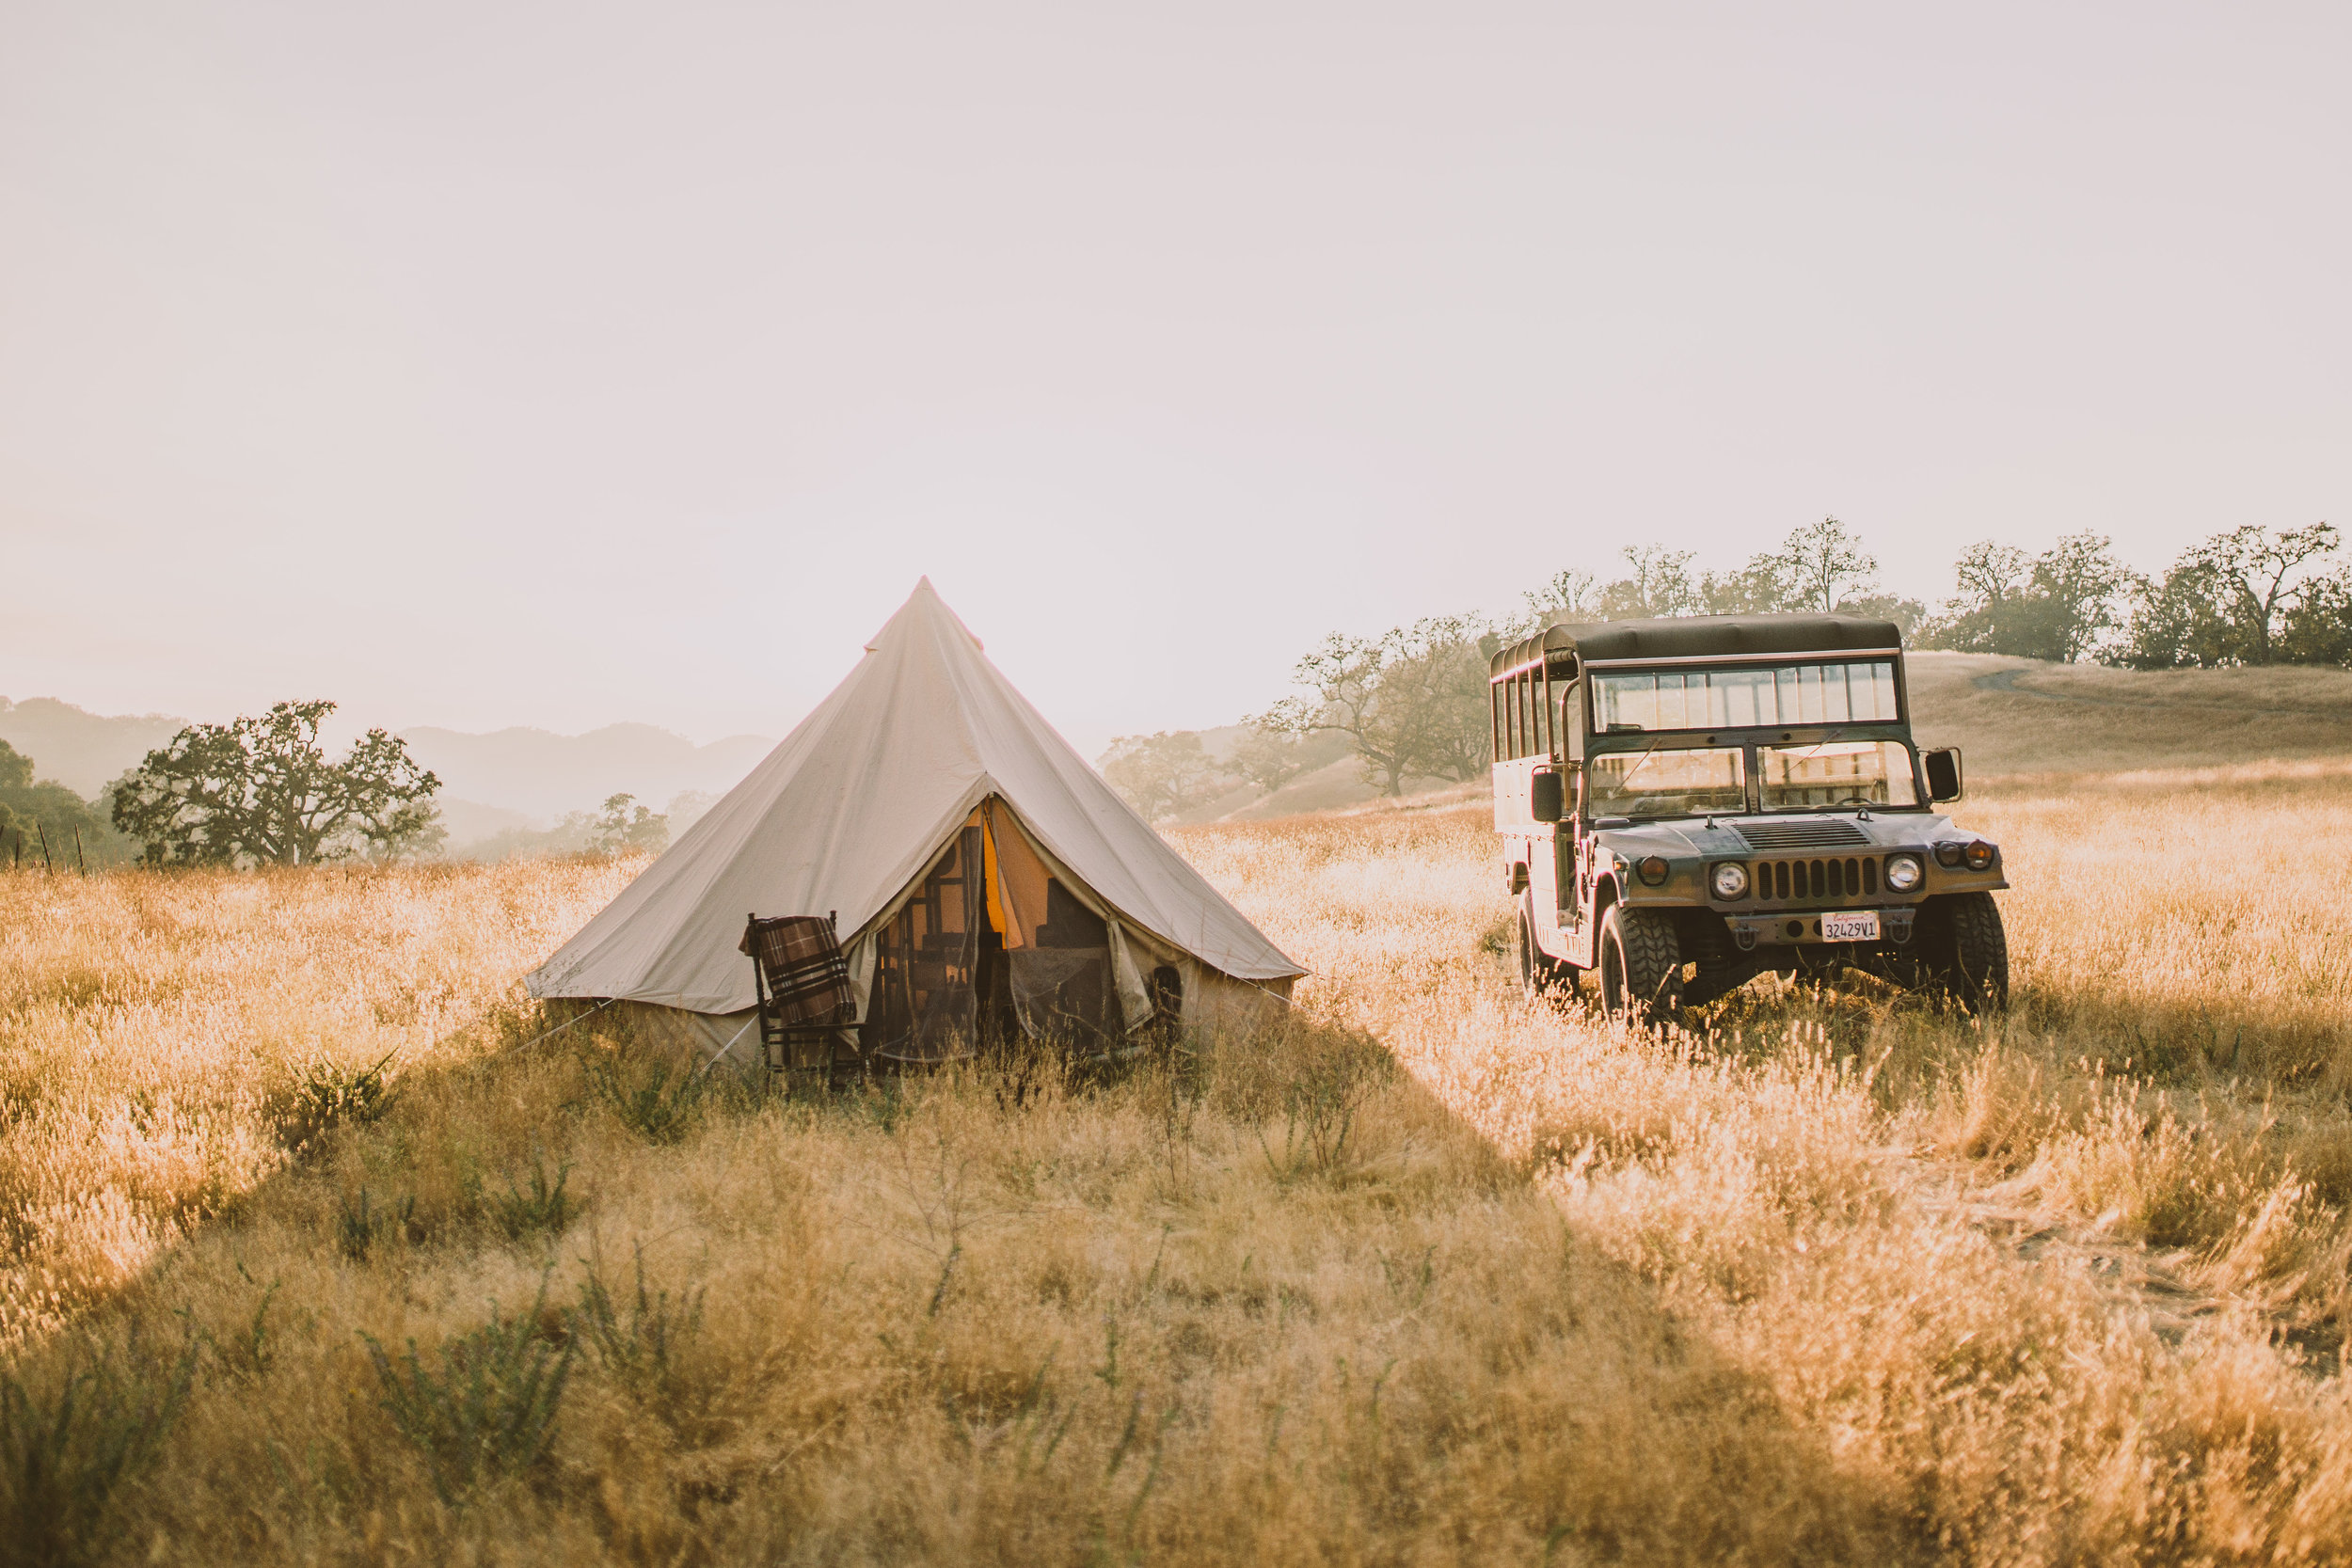 tinker-tin-trailer-co-bell-tent-1